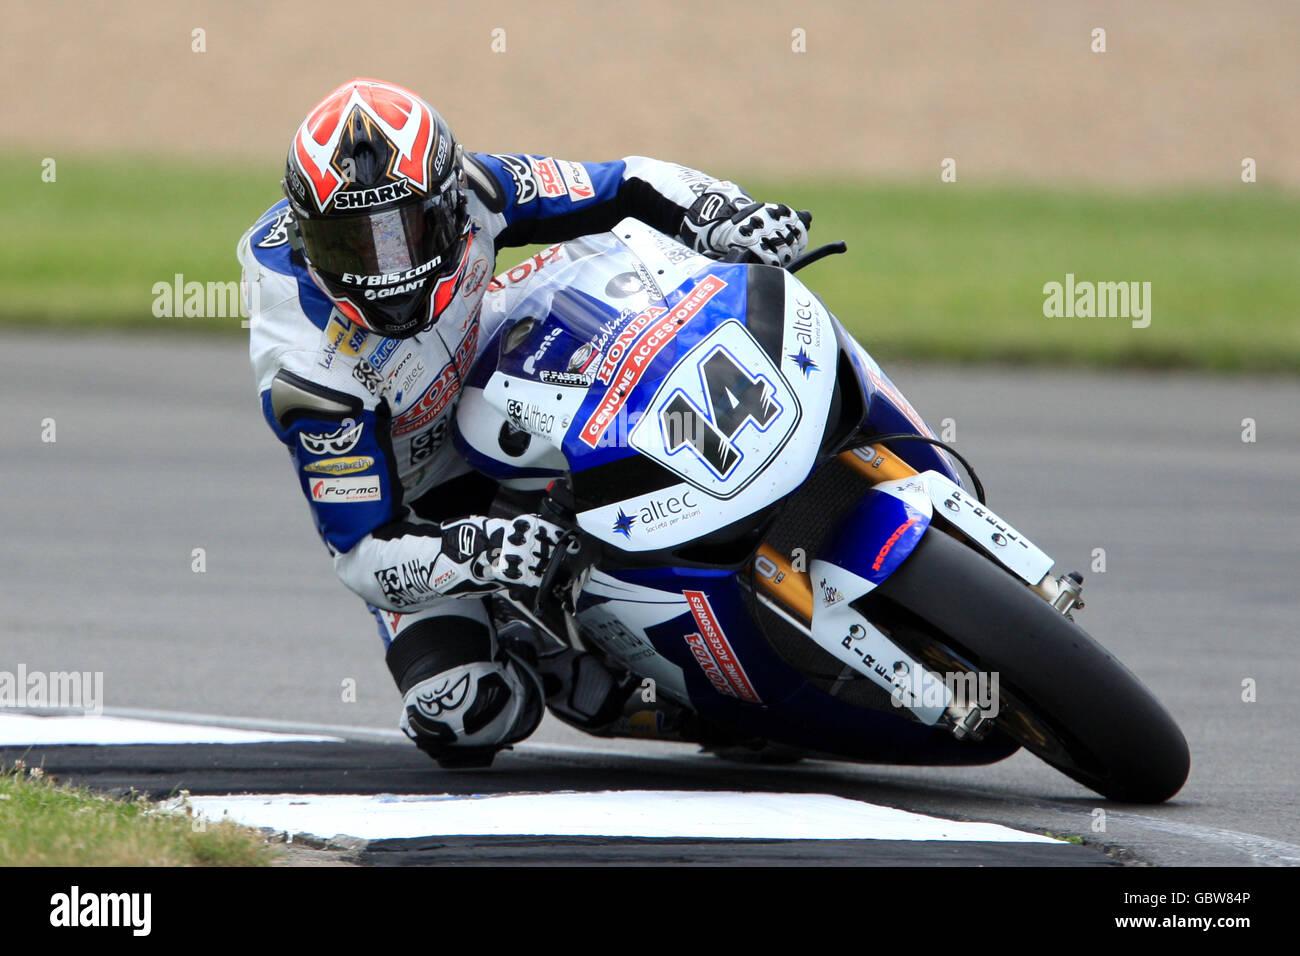 Motorcycling - SBK World Superbike Championship 2009 - Qualifying - Donington Park Stock Photo